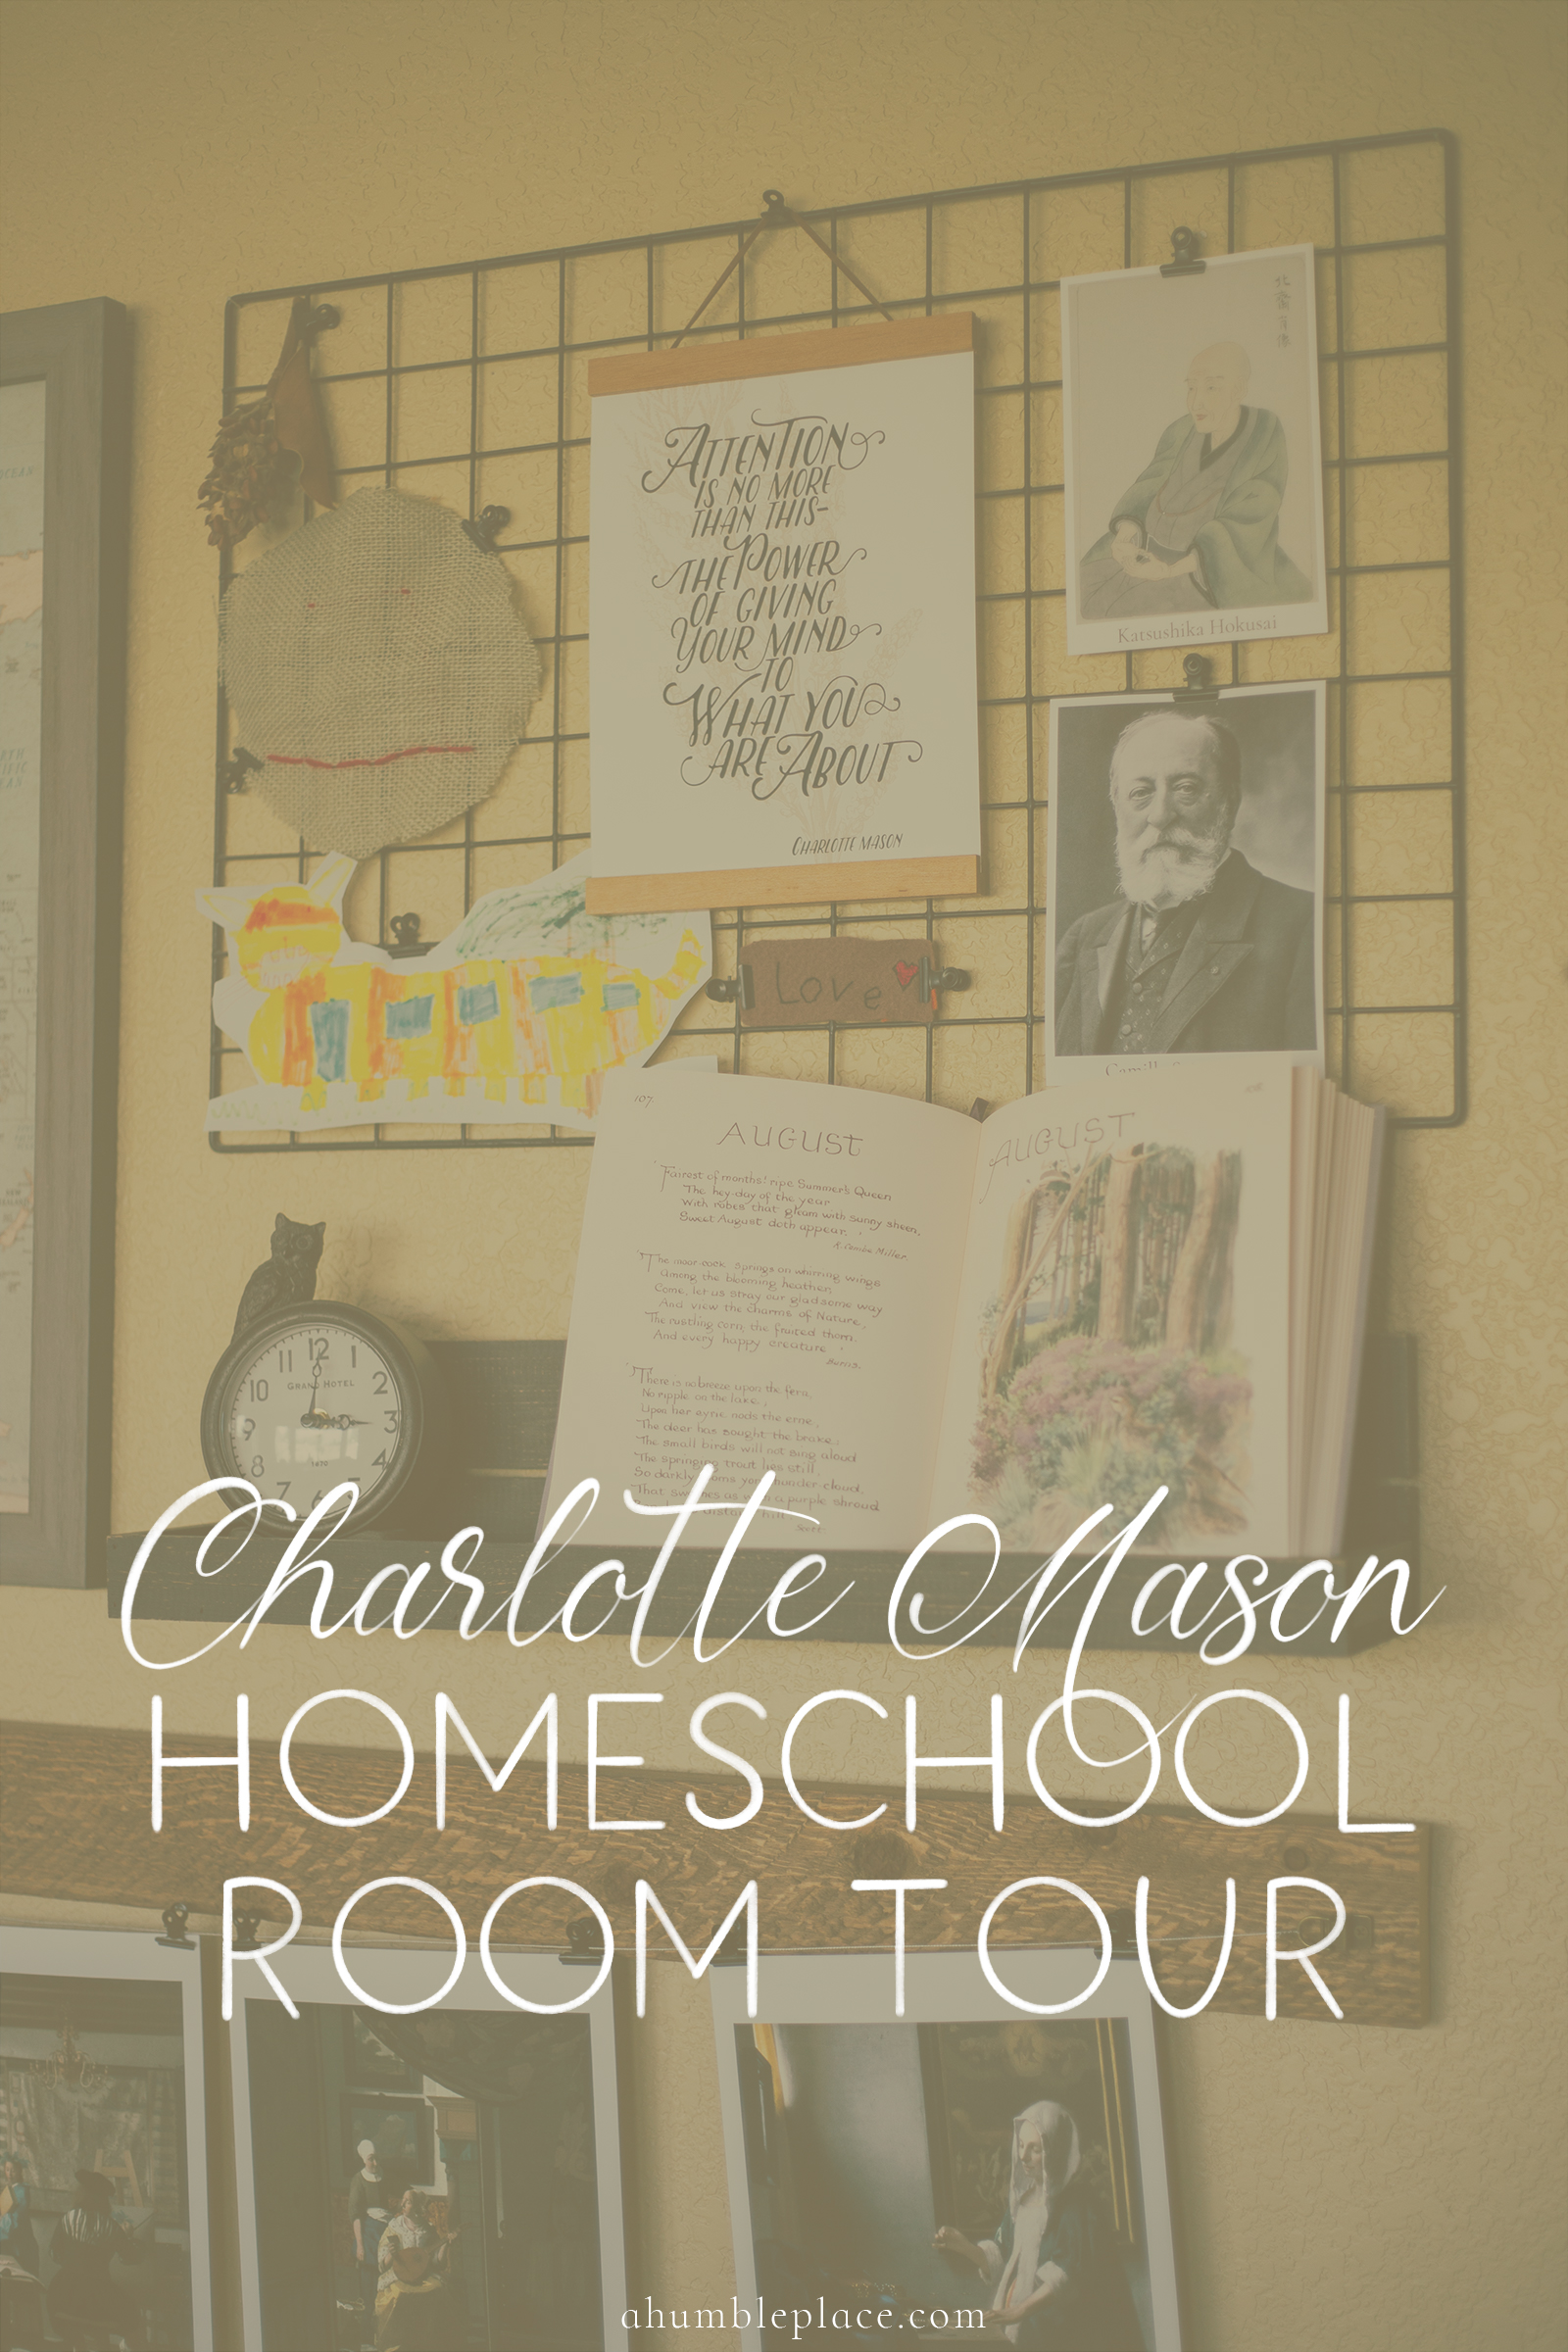 Charlotte Mason Homeschool Room Tour - ahumbleplace.com